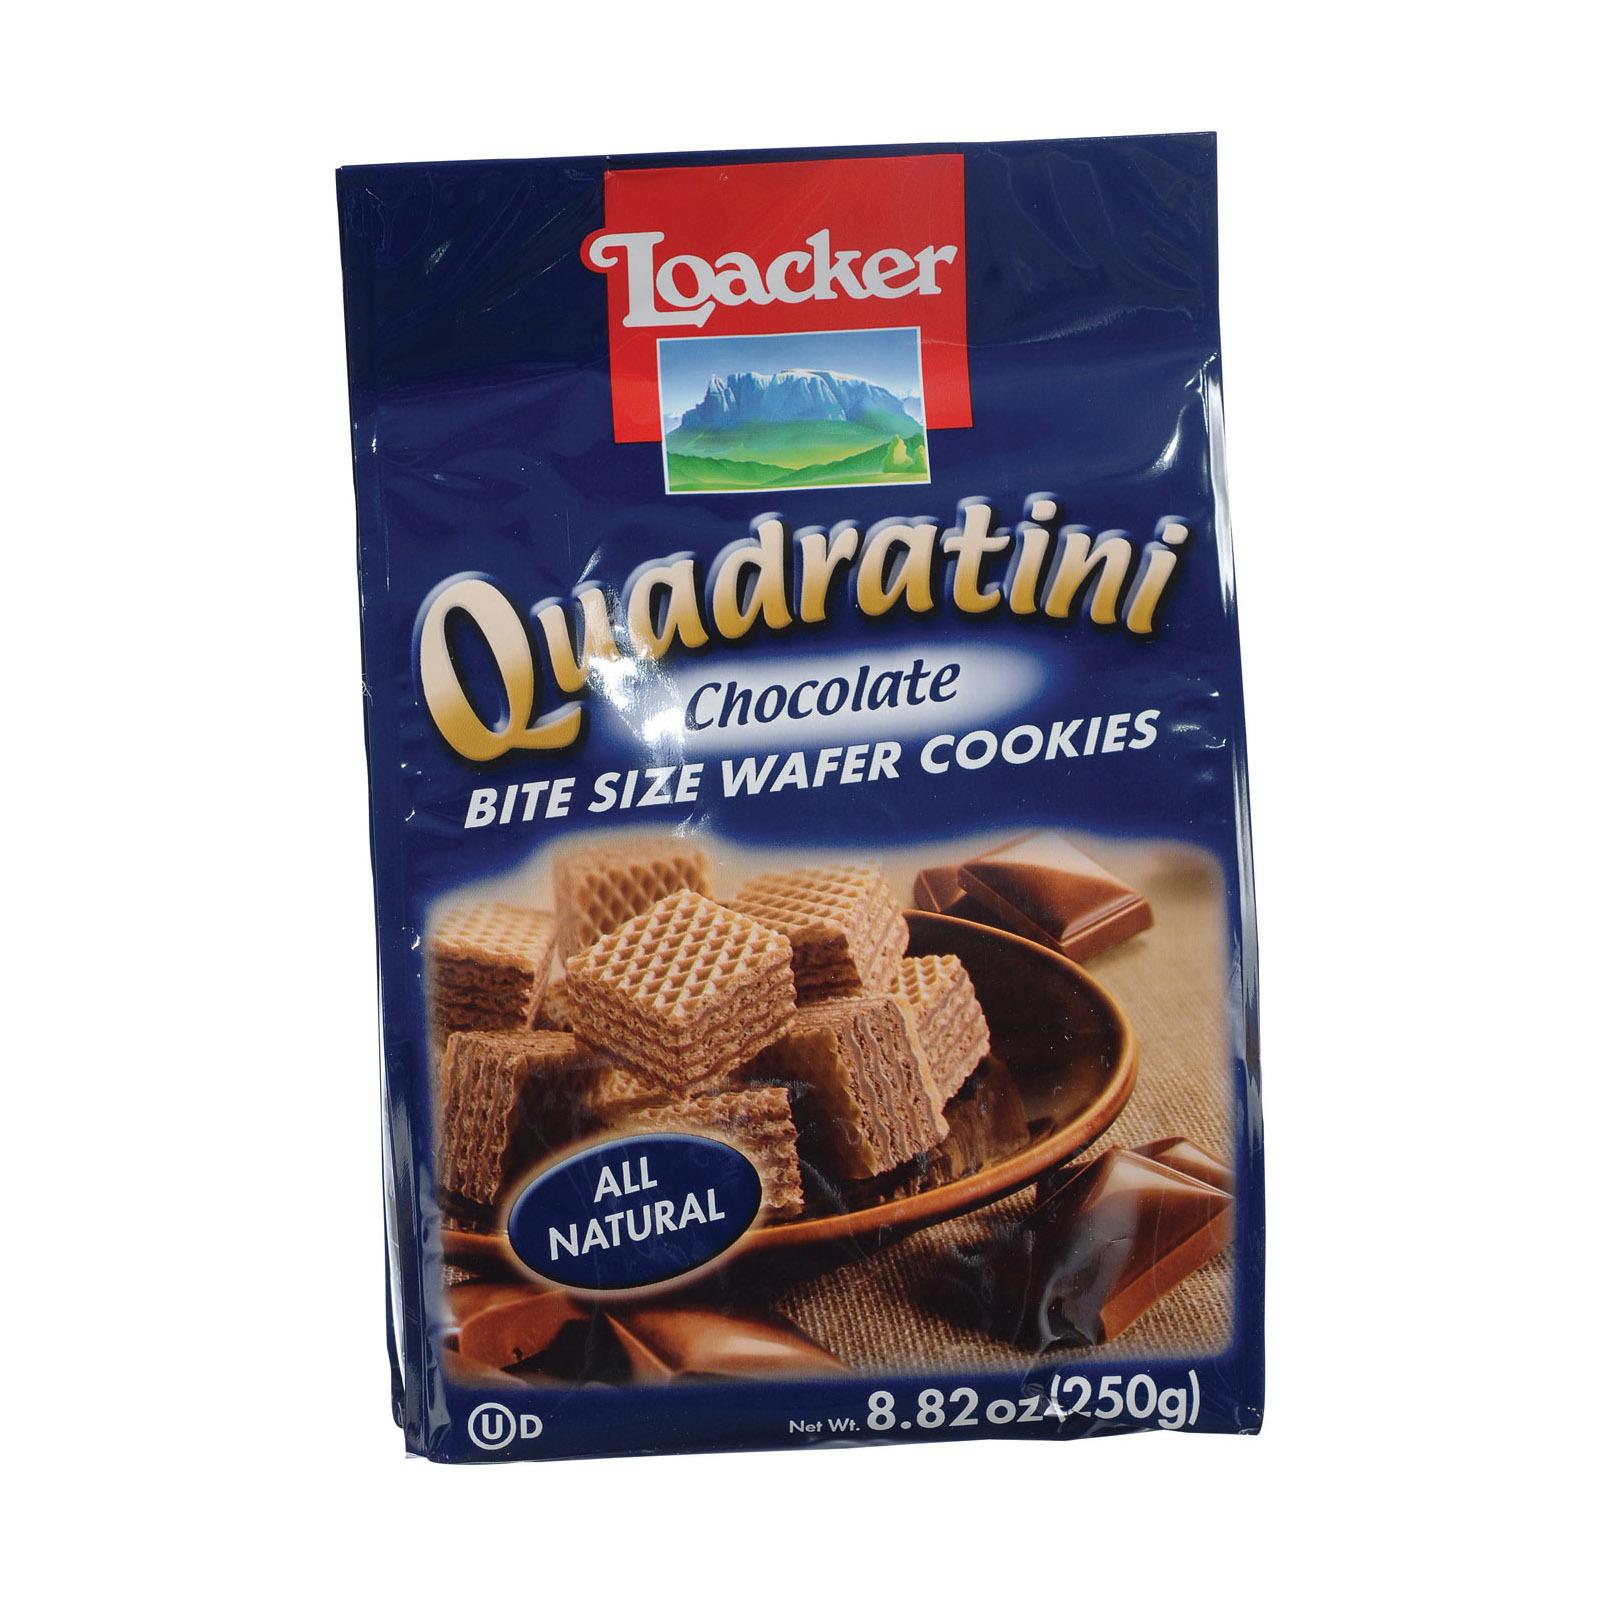 Loacker Quadratini Quadratini Chocolate Bite Size Wafer Cookies - Case of 8 - 8.82 oz.